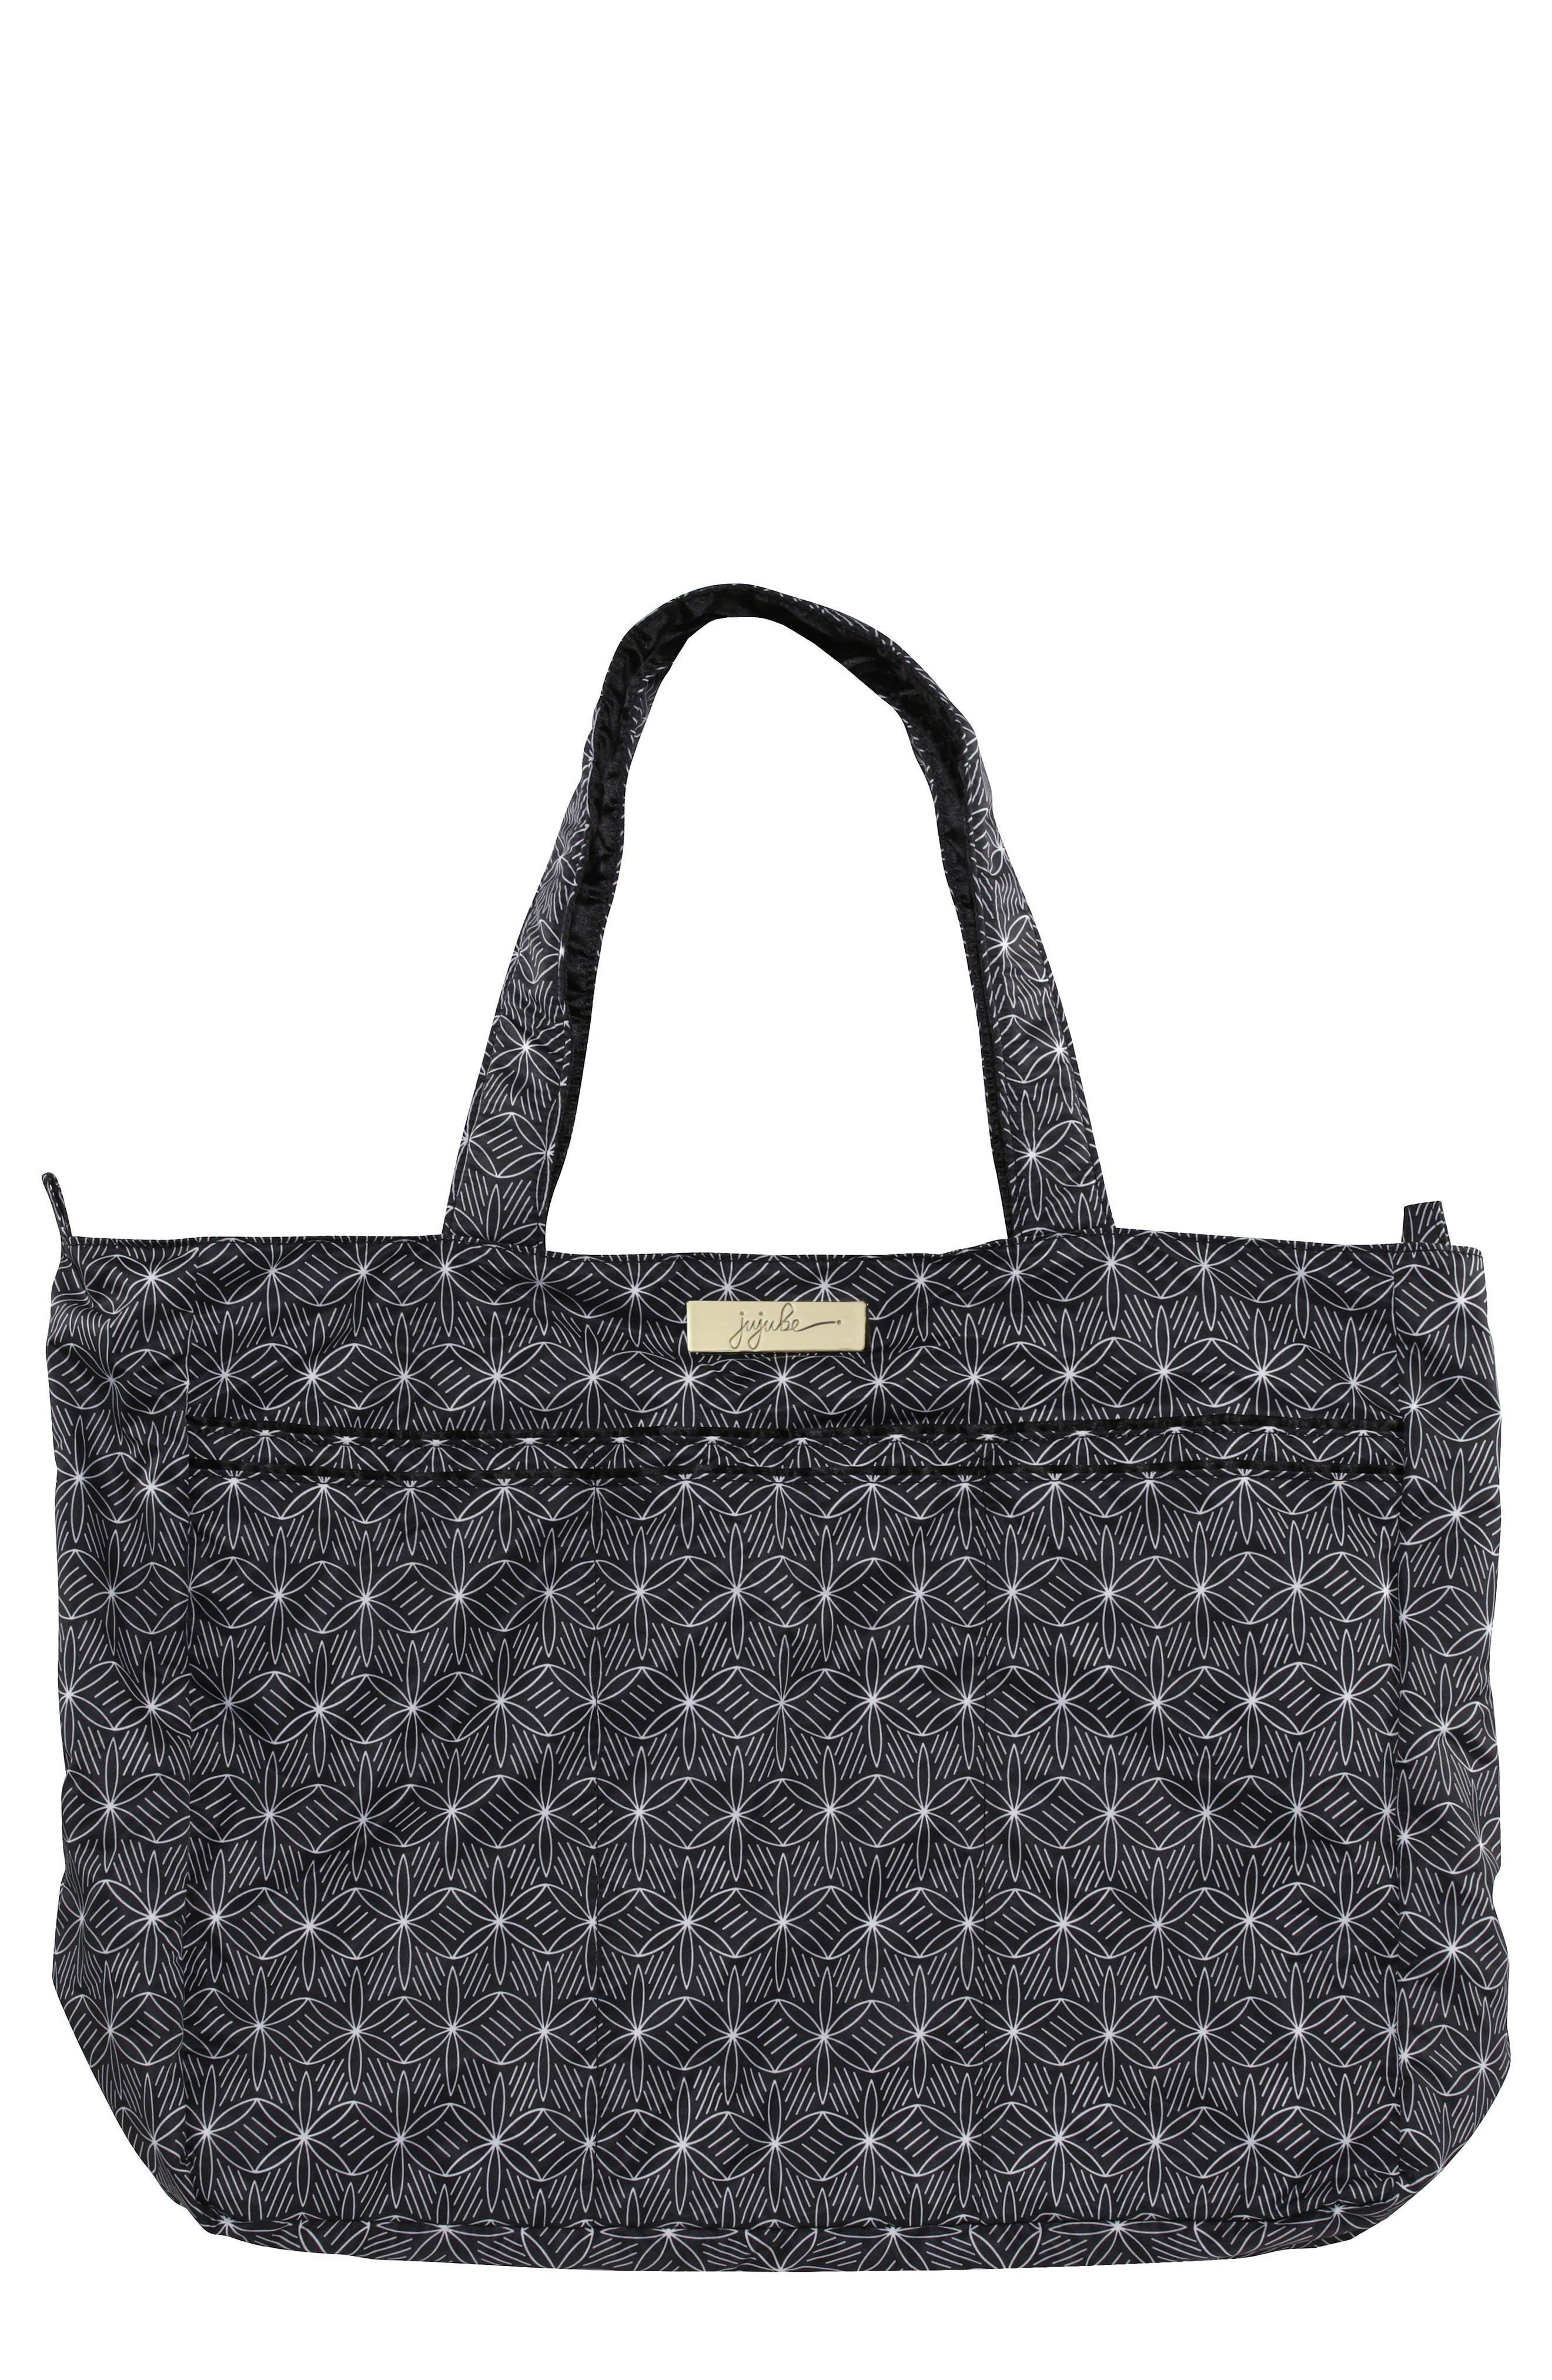 Alternate Image 1 Selected - Ju-Ju-Be 'Legacy Super Be - The First Lady' Diaper Bag